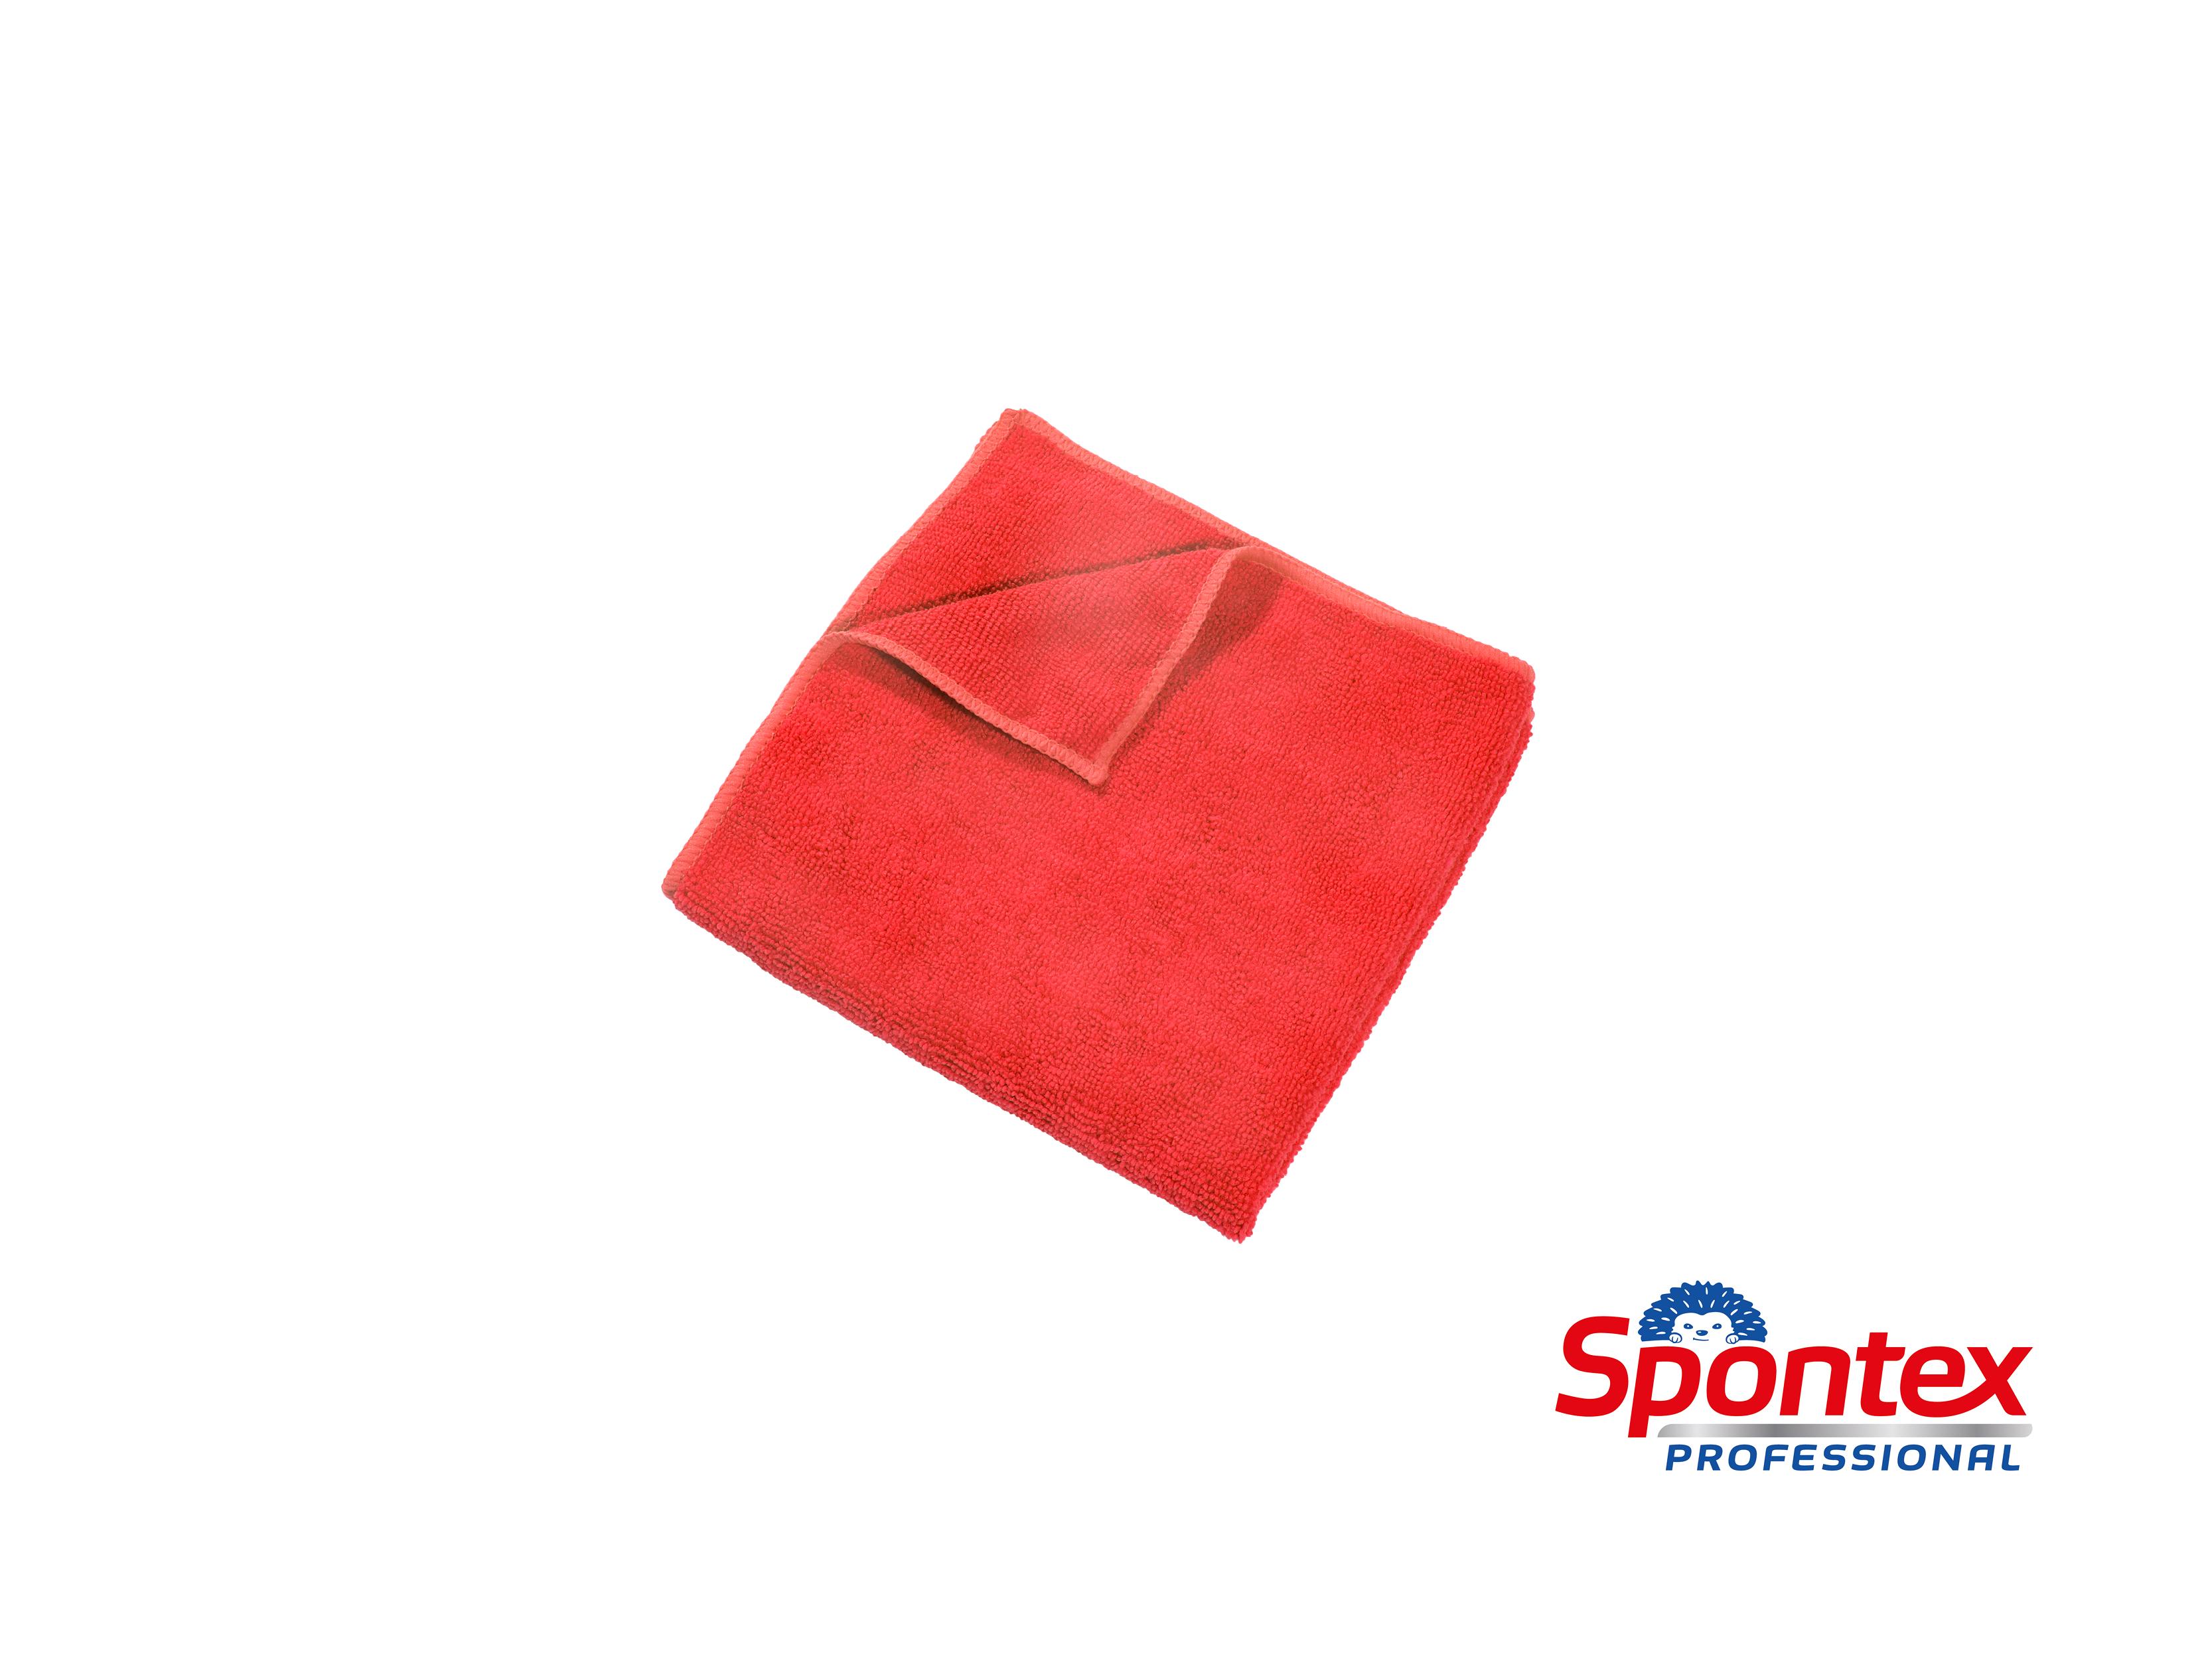 MF Pro Multiclean Red SPONTEX